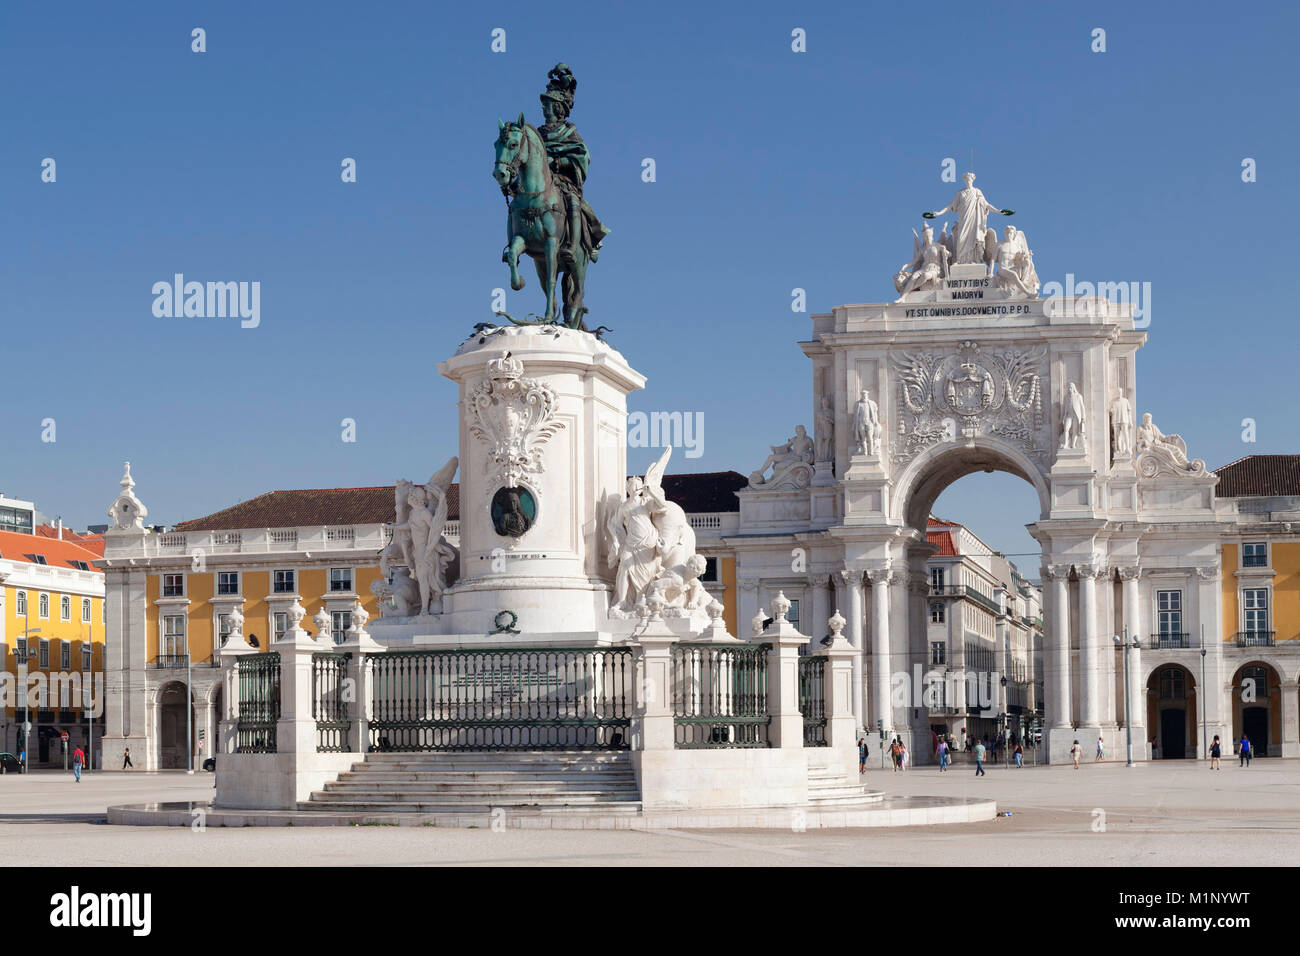 Arco da Rua Augusta arco trionfale, re Jose io monumento, Praca do Comercio, Baixa, Lisbona, Portogallo, Europa Immagini Stock